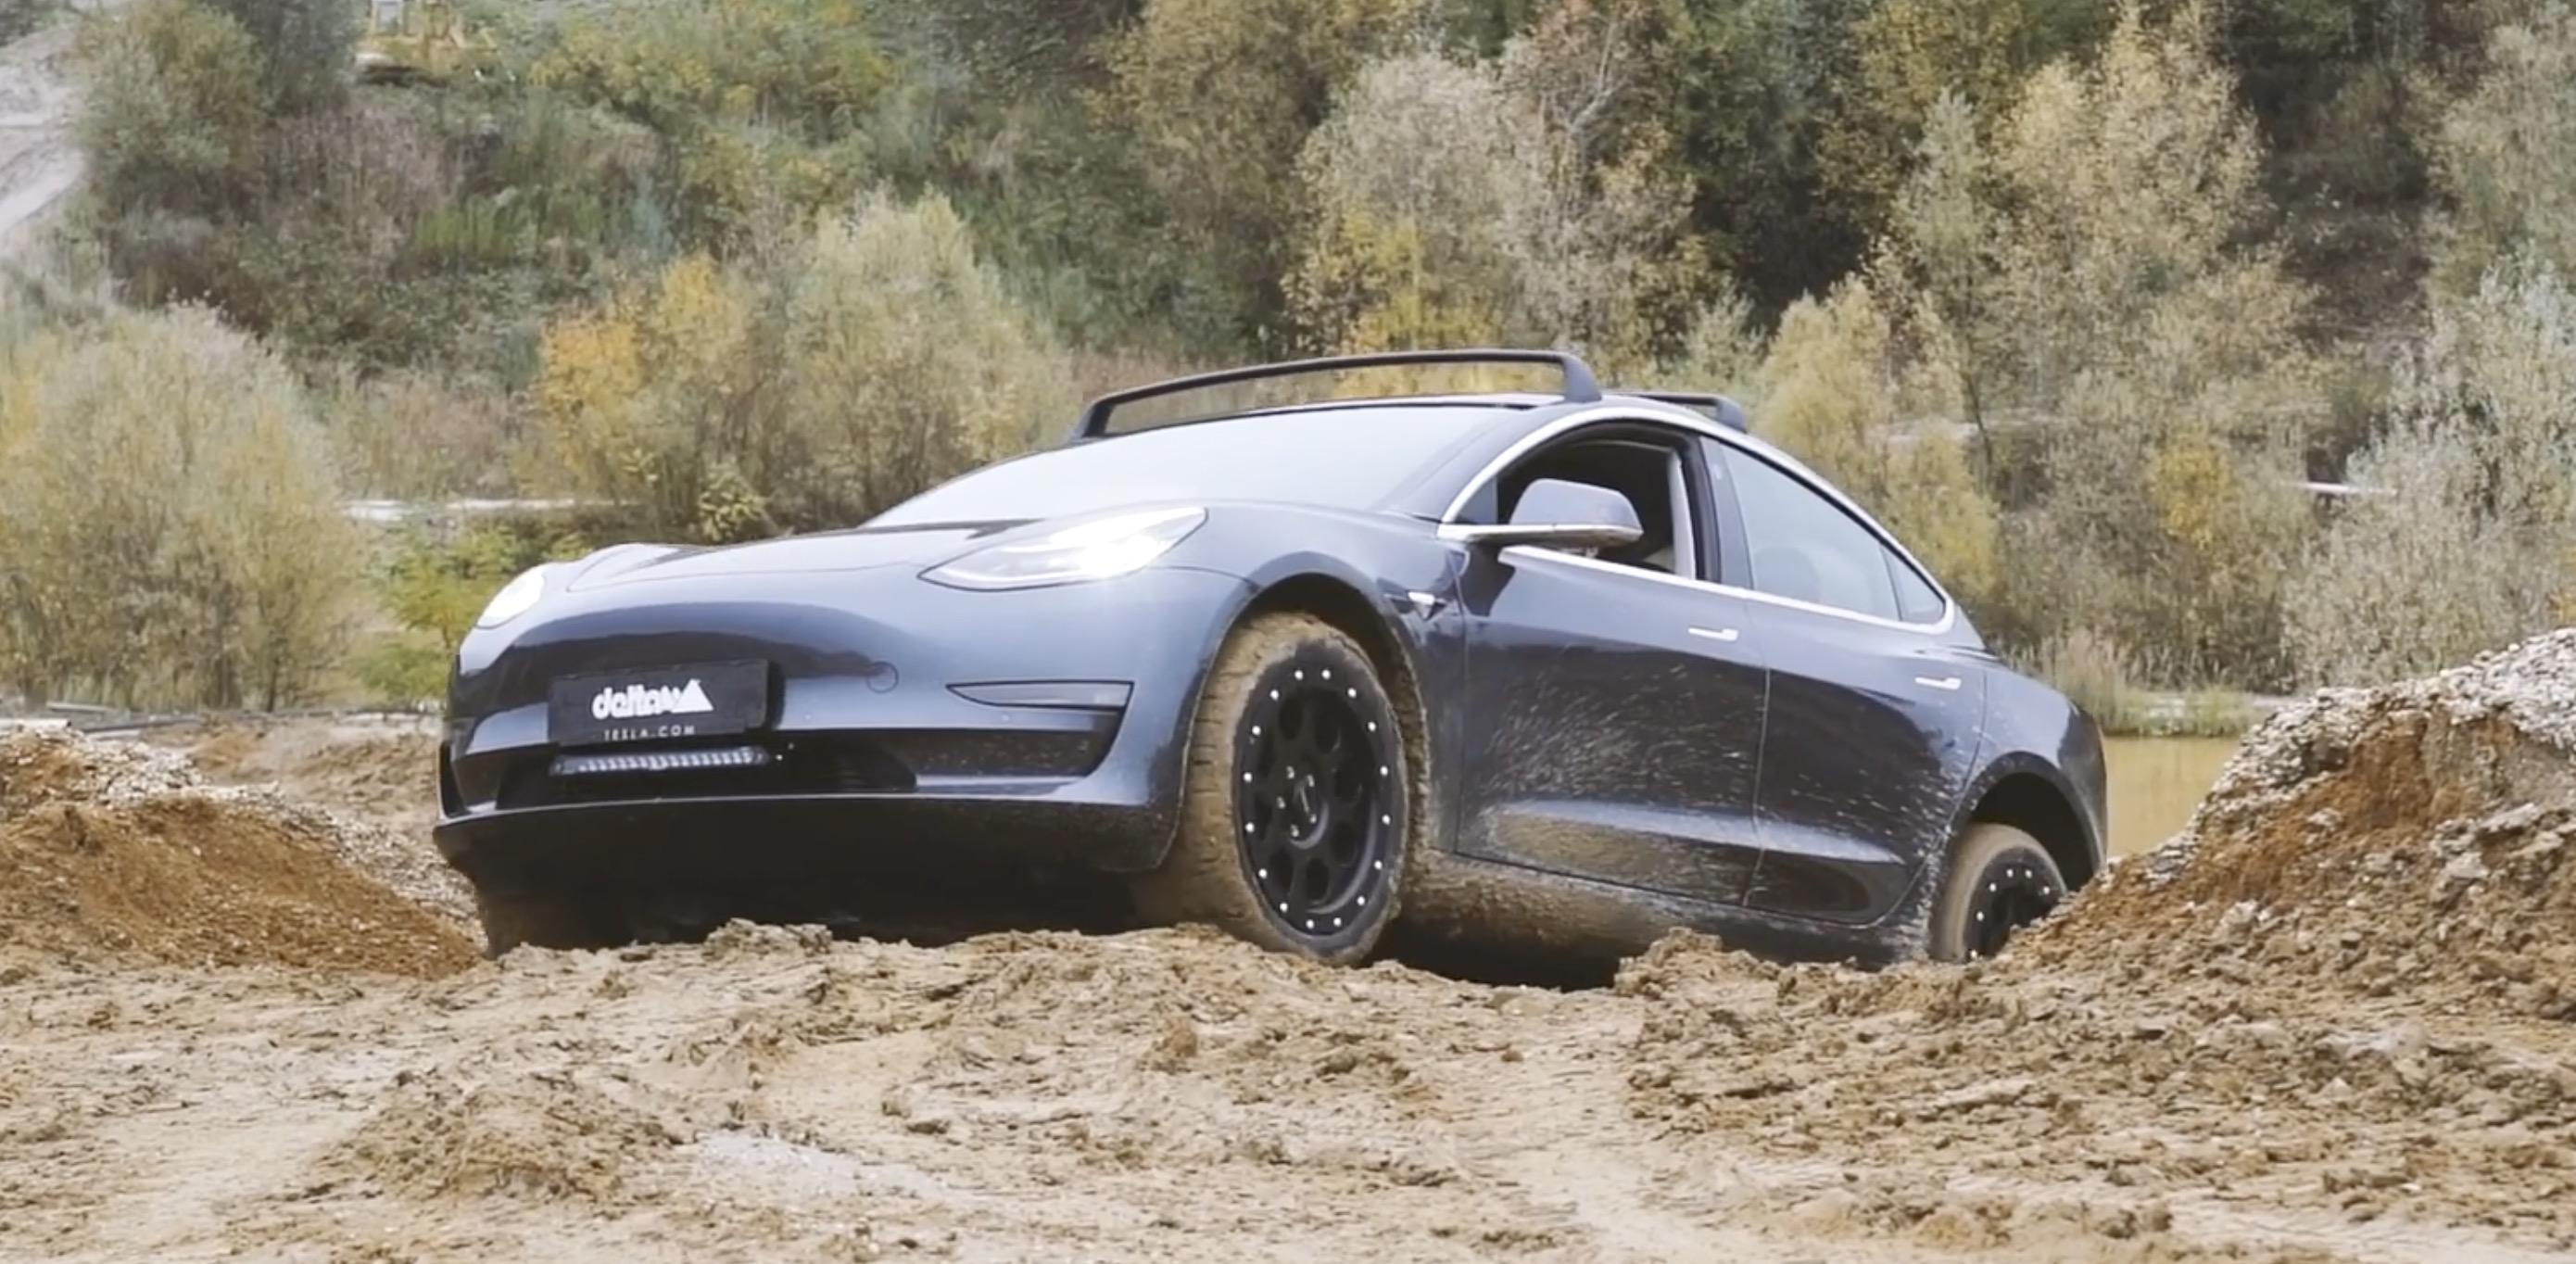 Tesla Model 3 looks like rugged electric off-road machine ...